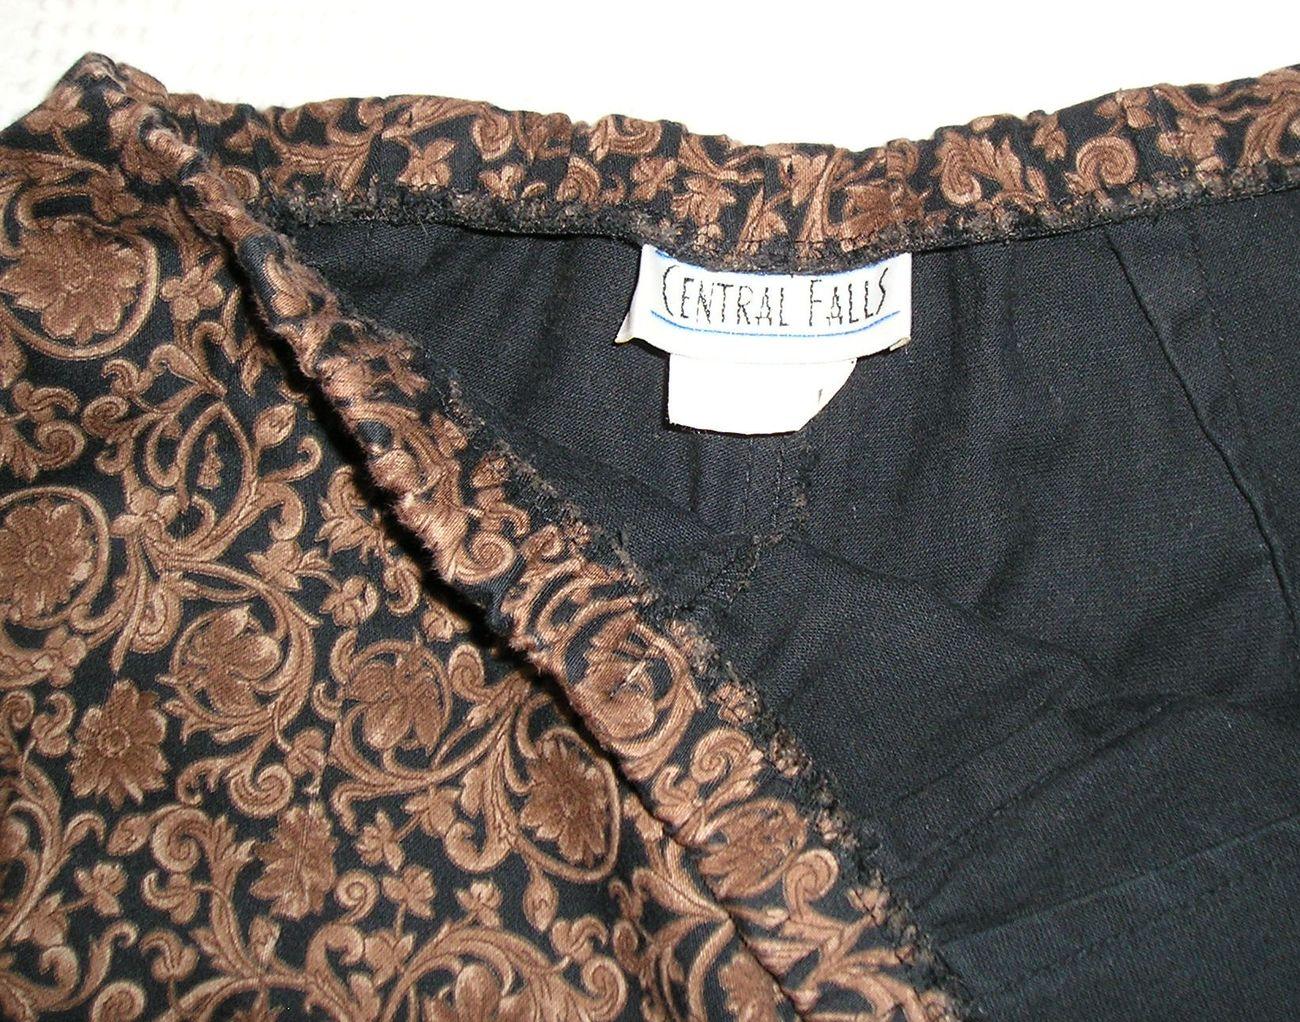 CENTRAL FALLS Women's Brown/Black Pants M (Medium) / 6 - 8 image 3